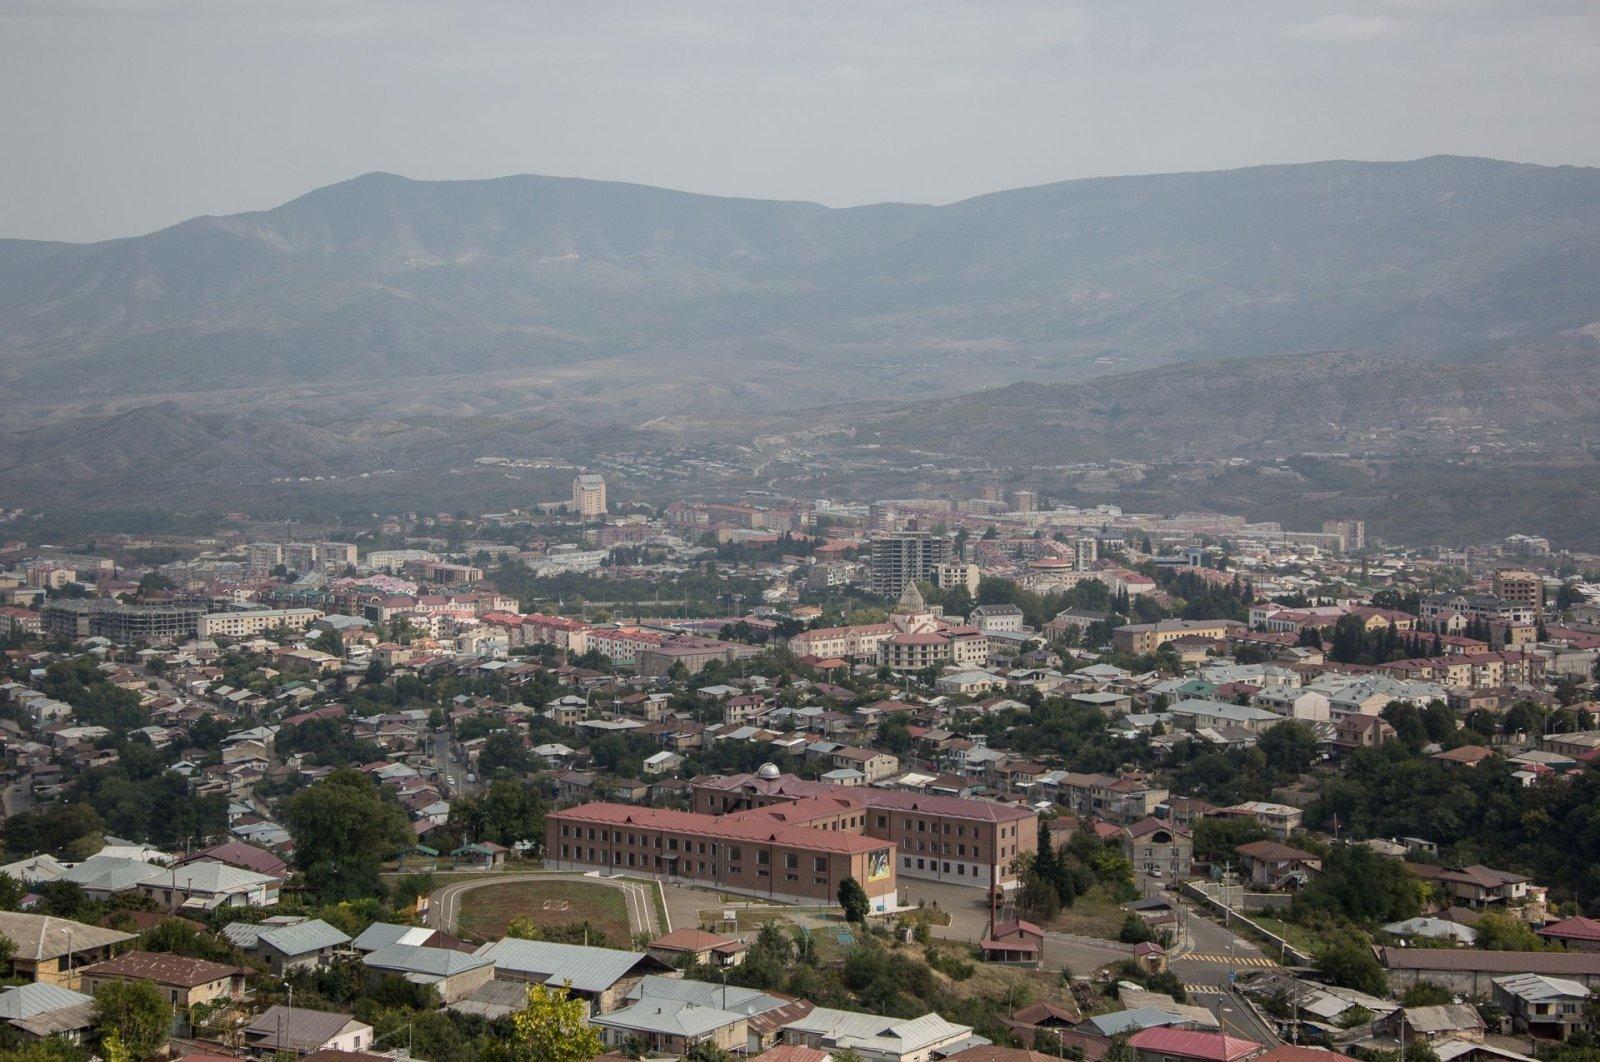 Aerial view of Stepanakert, in occupied Nagorno-Karabakh, Azerbaijan, Sept. 29, 2020. (AFP Photo/Press service of Armenia's government)